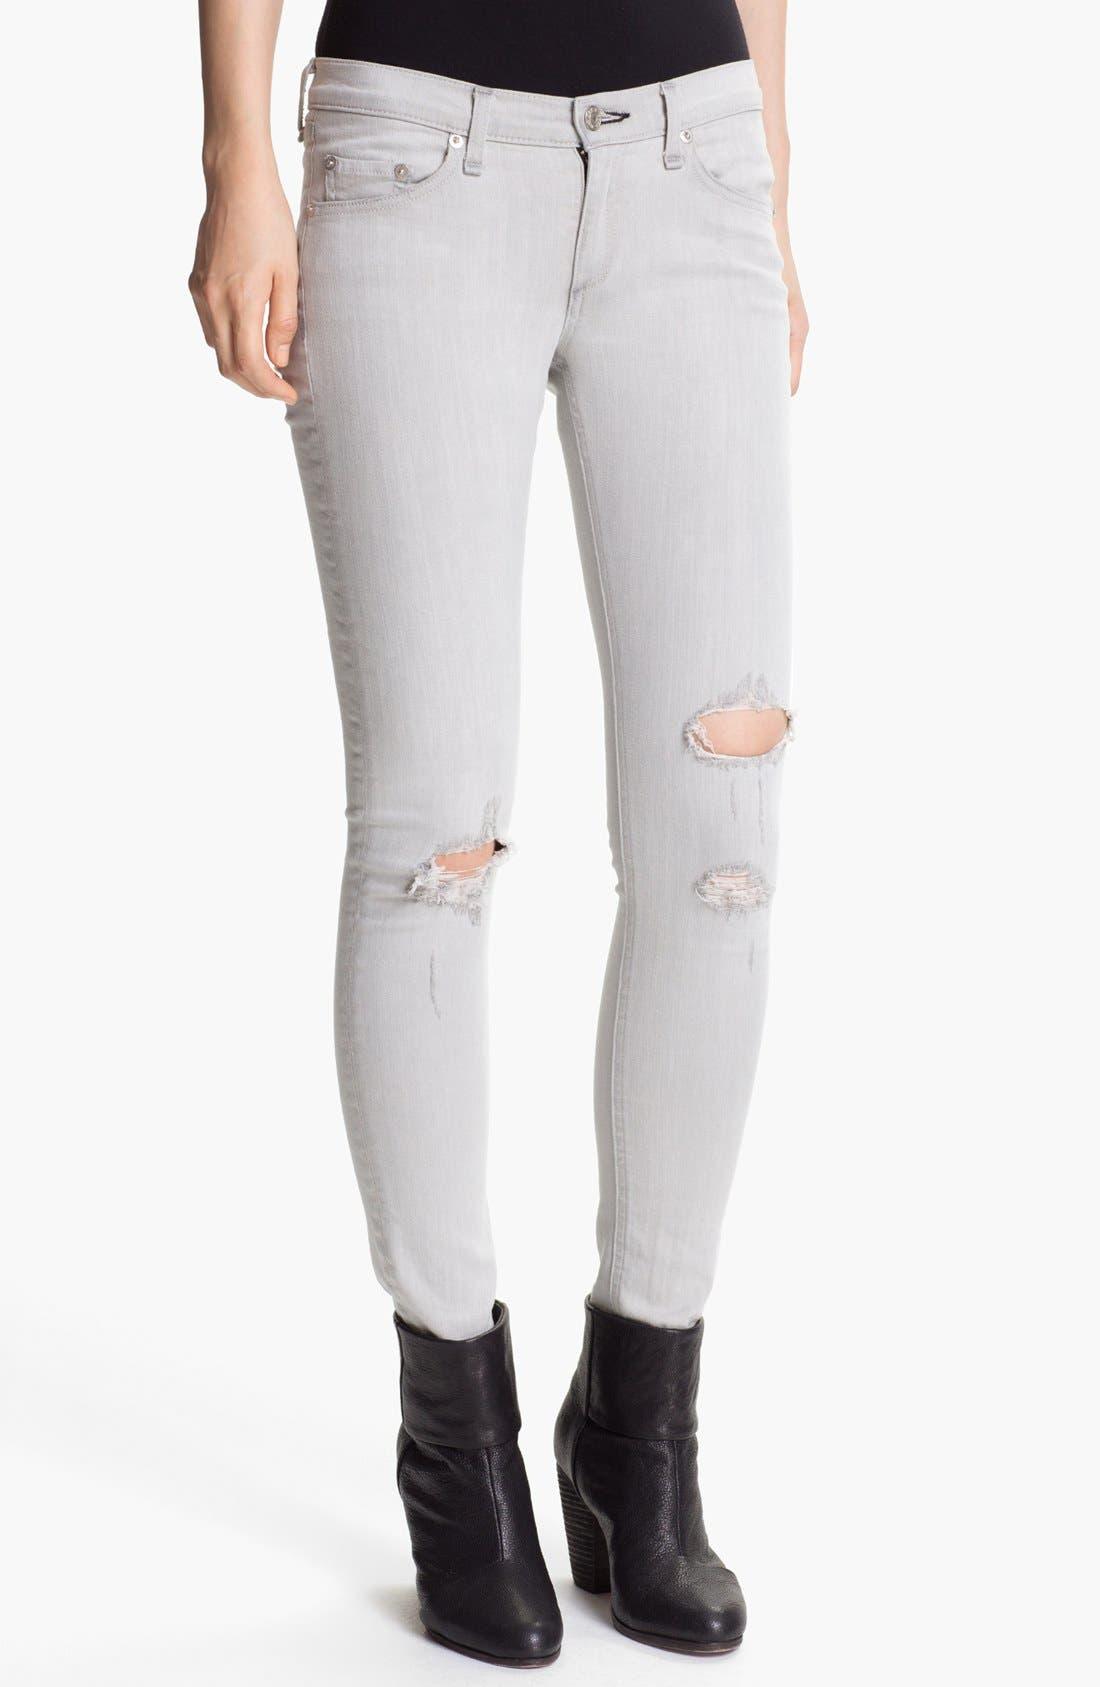 Alternate Image 1 Selected - rag & bone/JEAN 'The Skinny' Stretch Jeans (Surrey)